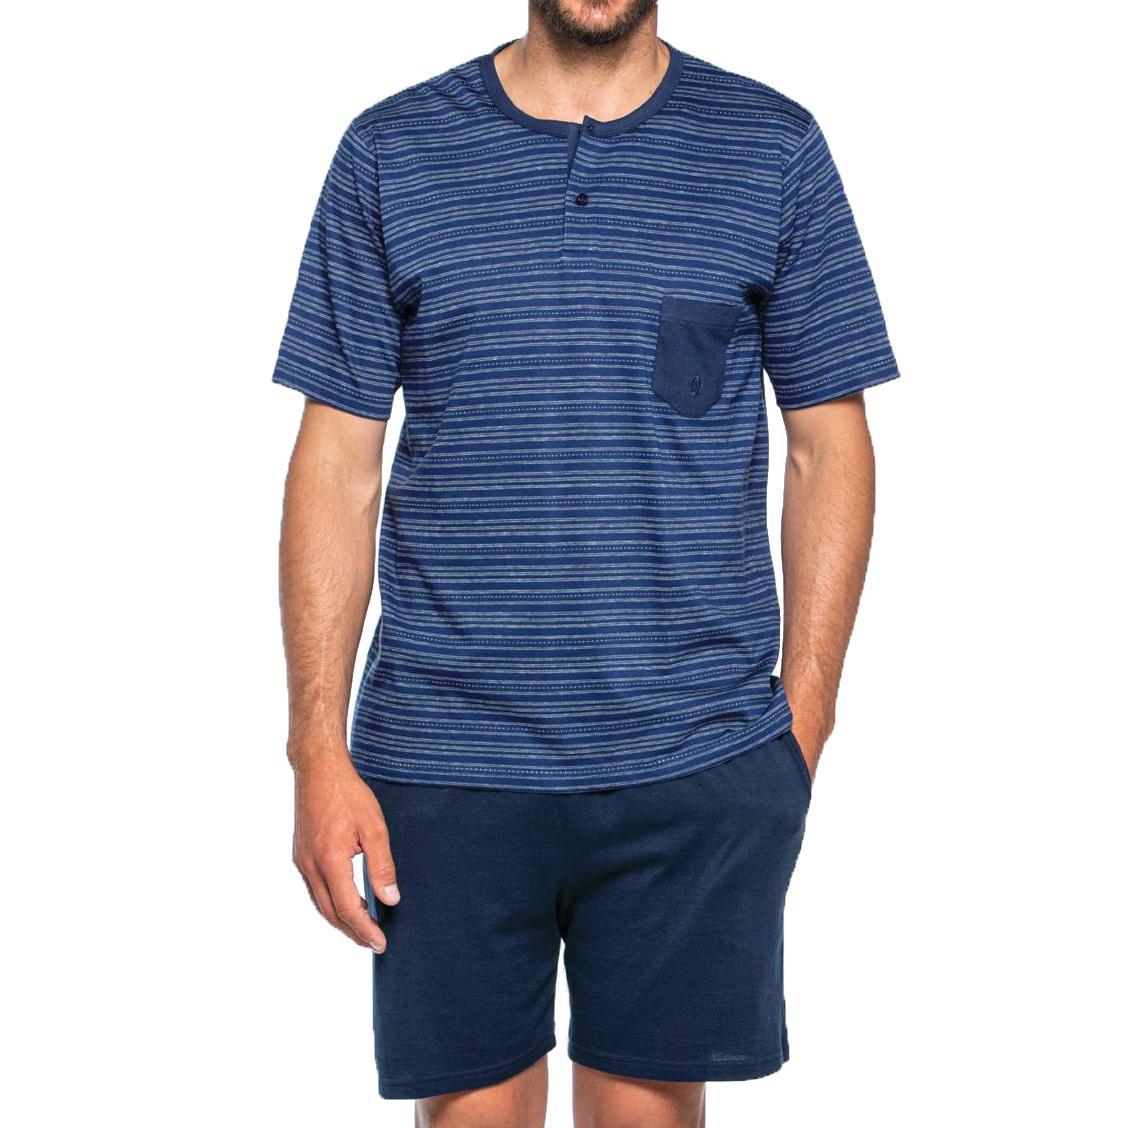 Pyjama court Guasch en coton : tee-shirt col tunisien bleu marine à fines rayures fantaisie blanches et short bleu marine